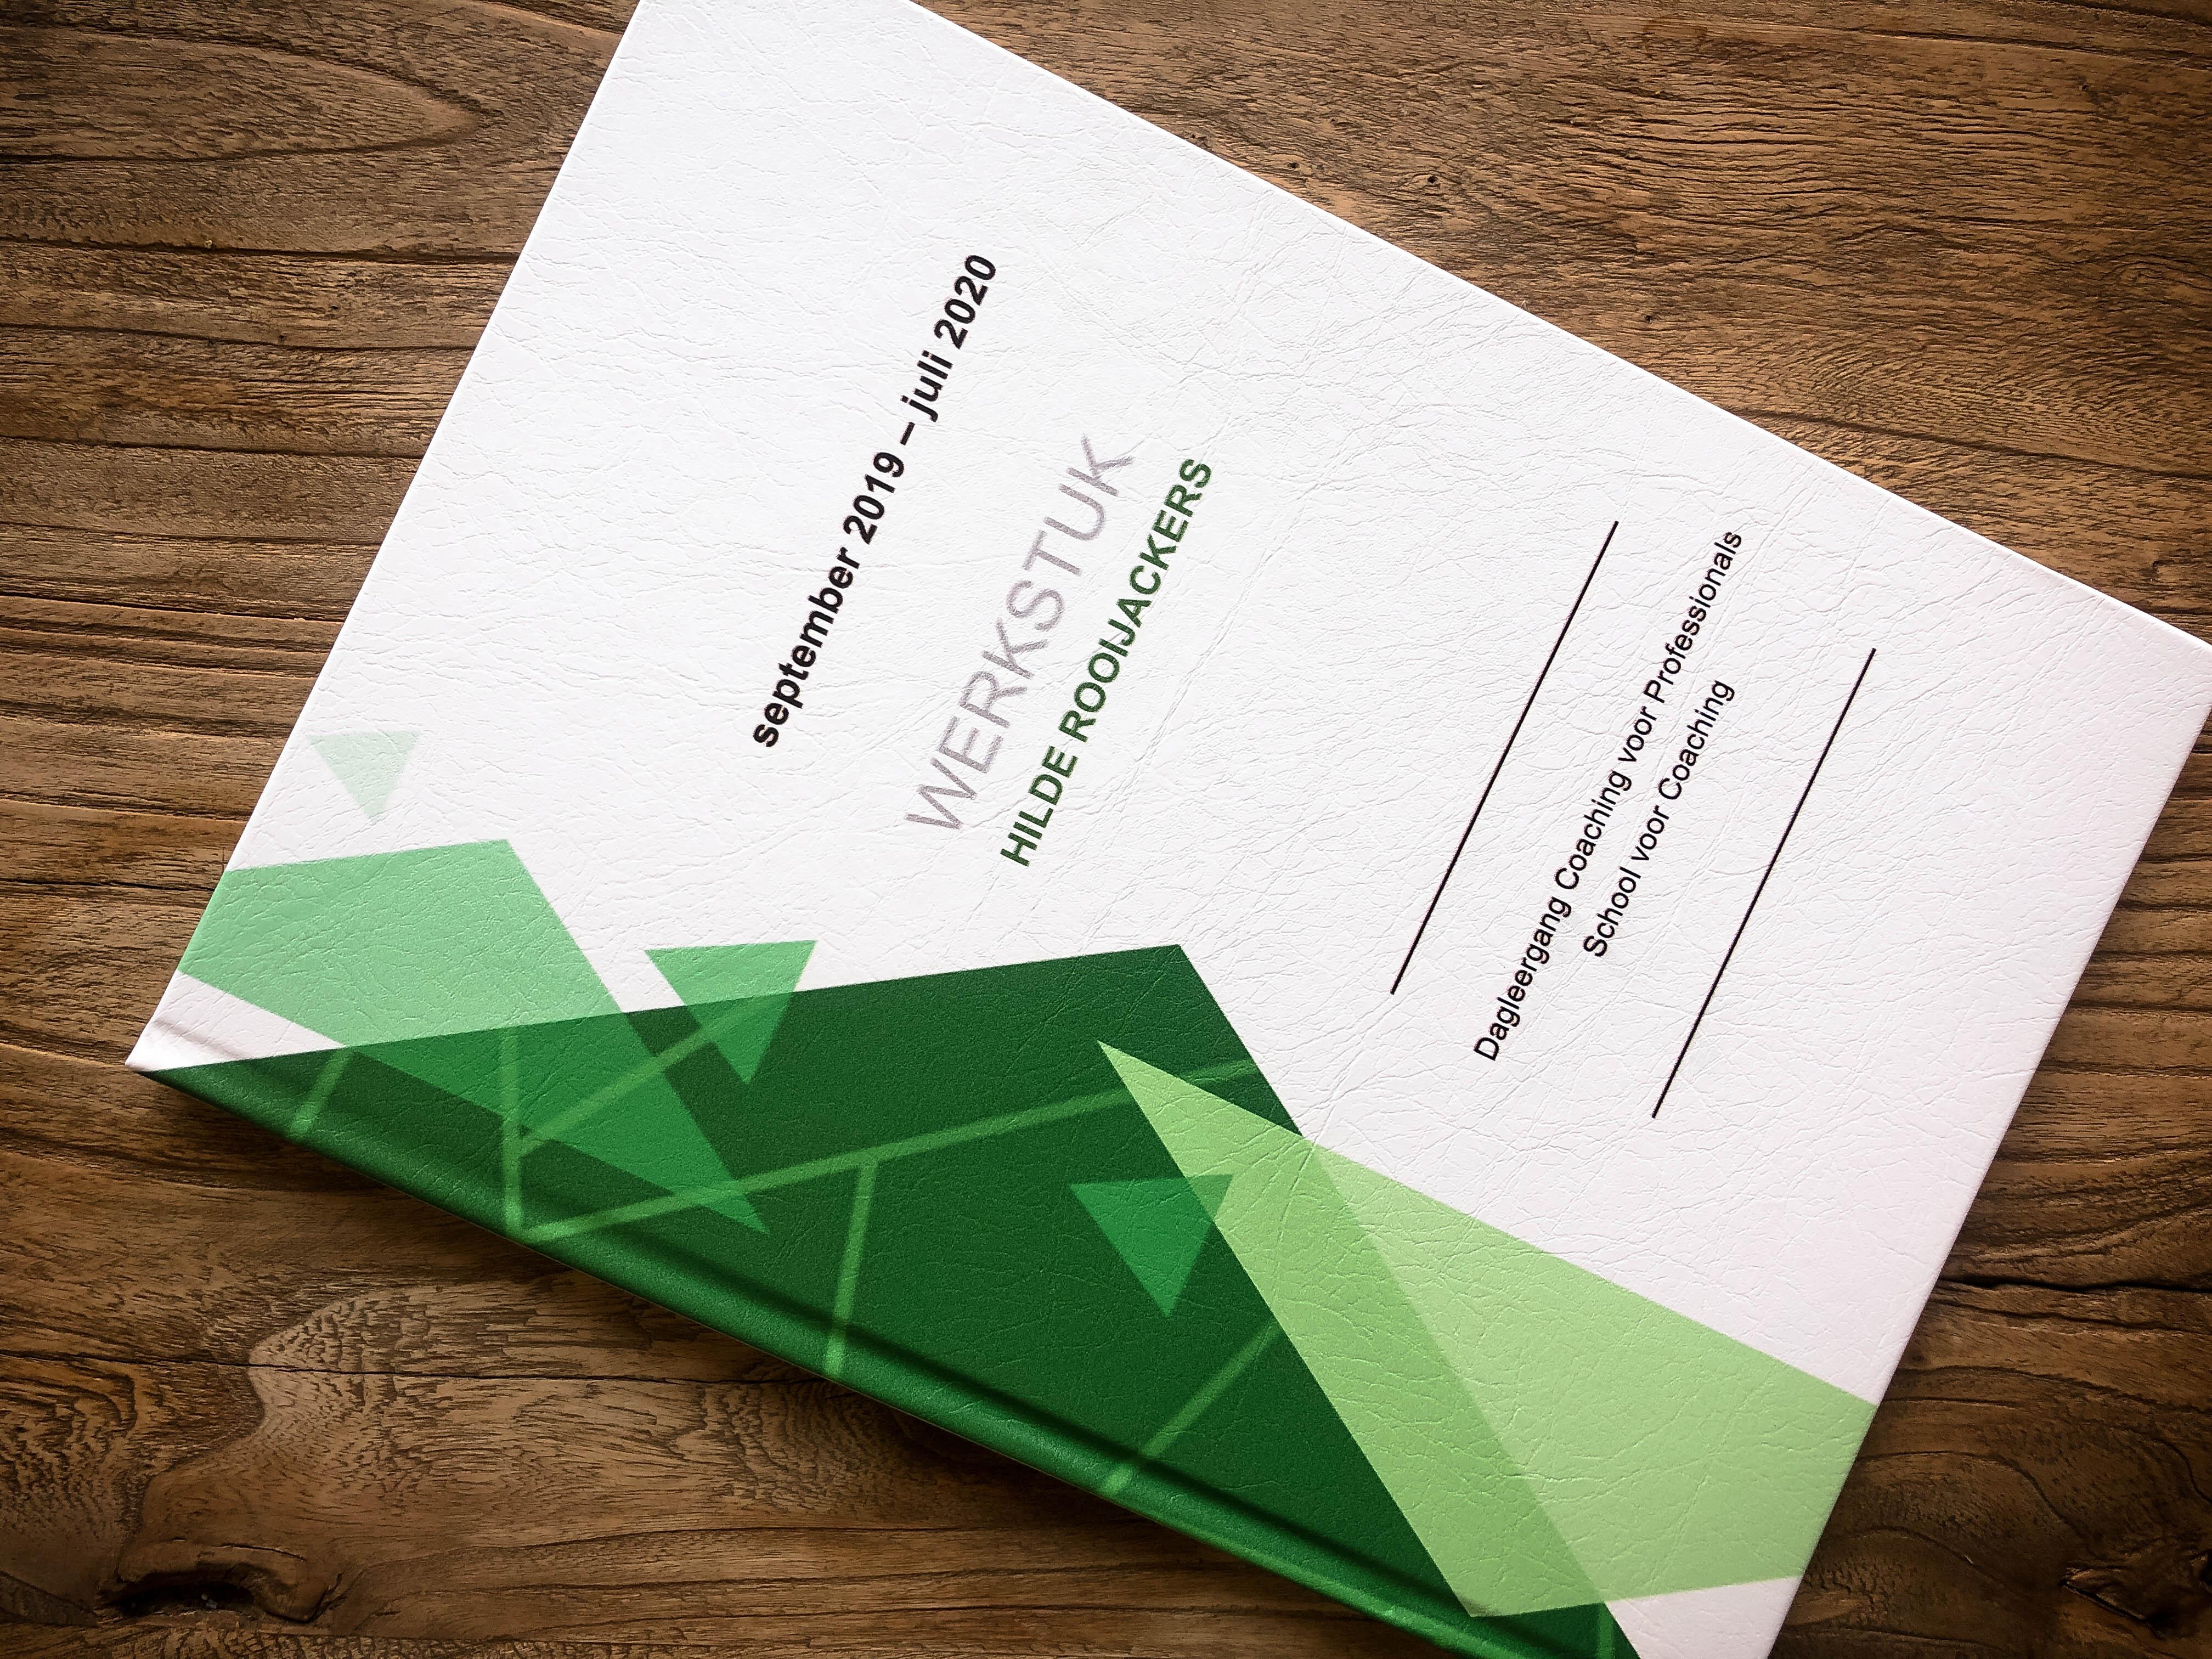 Eerste hulp bij scriptiestress – in samenwerking met Studentendrukwerk.nl